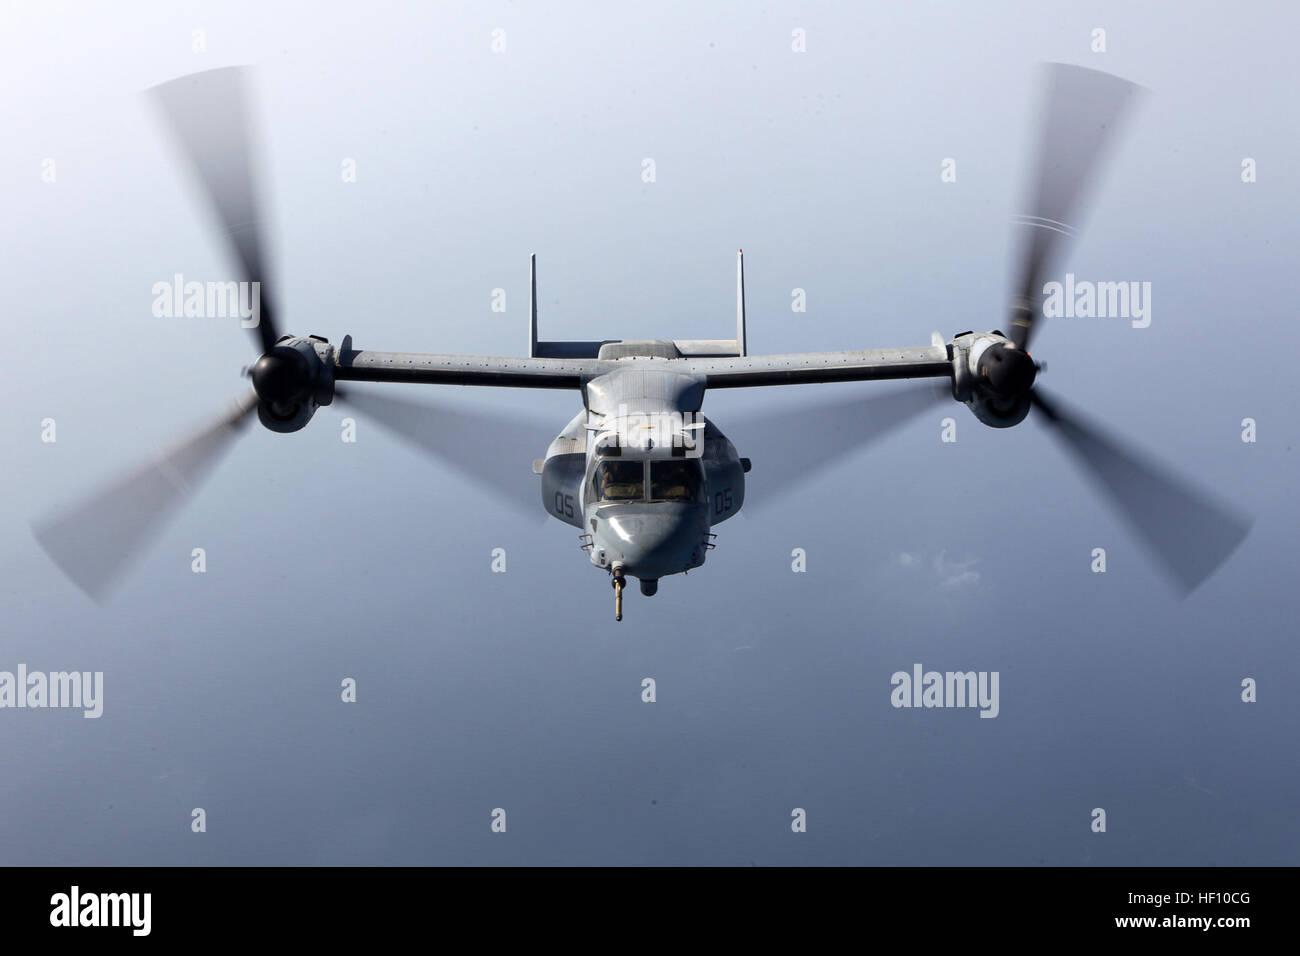 U.S. 5th FLEET AREA OF RESPONSIBILITY (Sept 23, 2012) – An MV-22B Osprey with Marine Medium Tiltrotor Squadron 261 Stock Photo